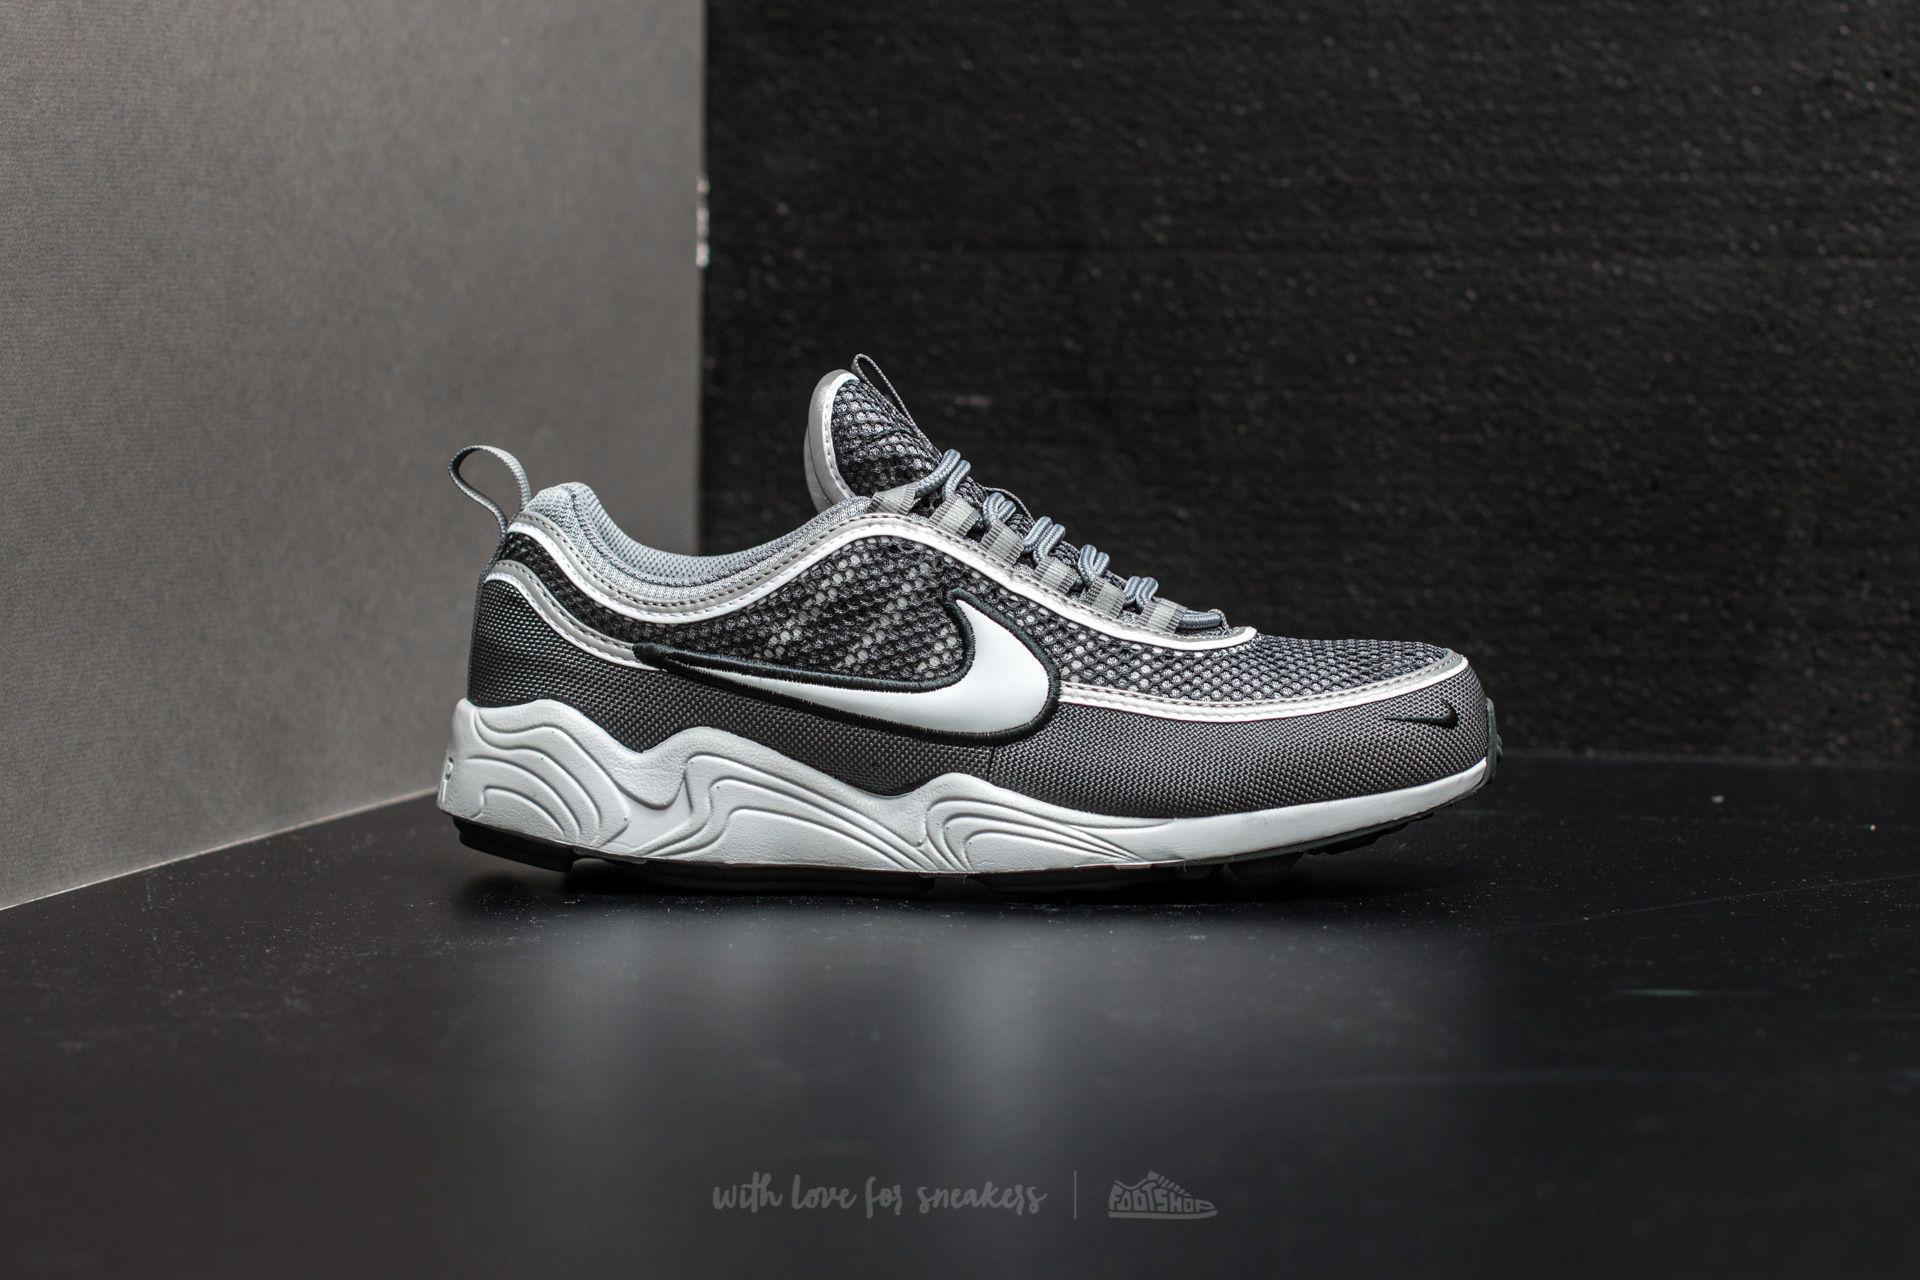 Nike Air Zoom Spiridon '16 Dark Grey